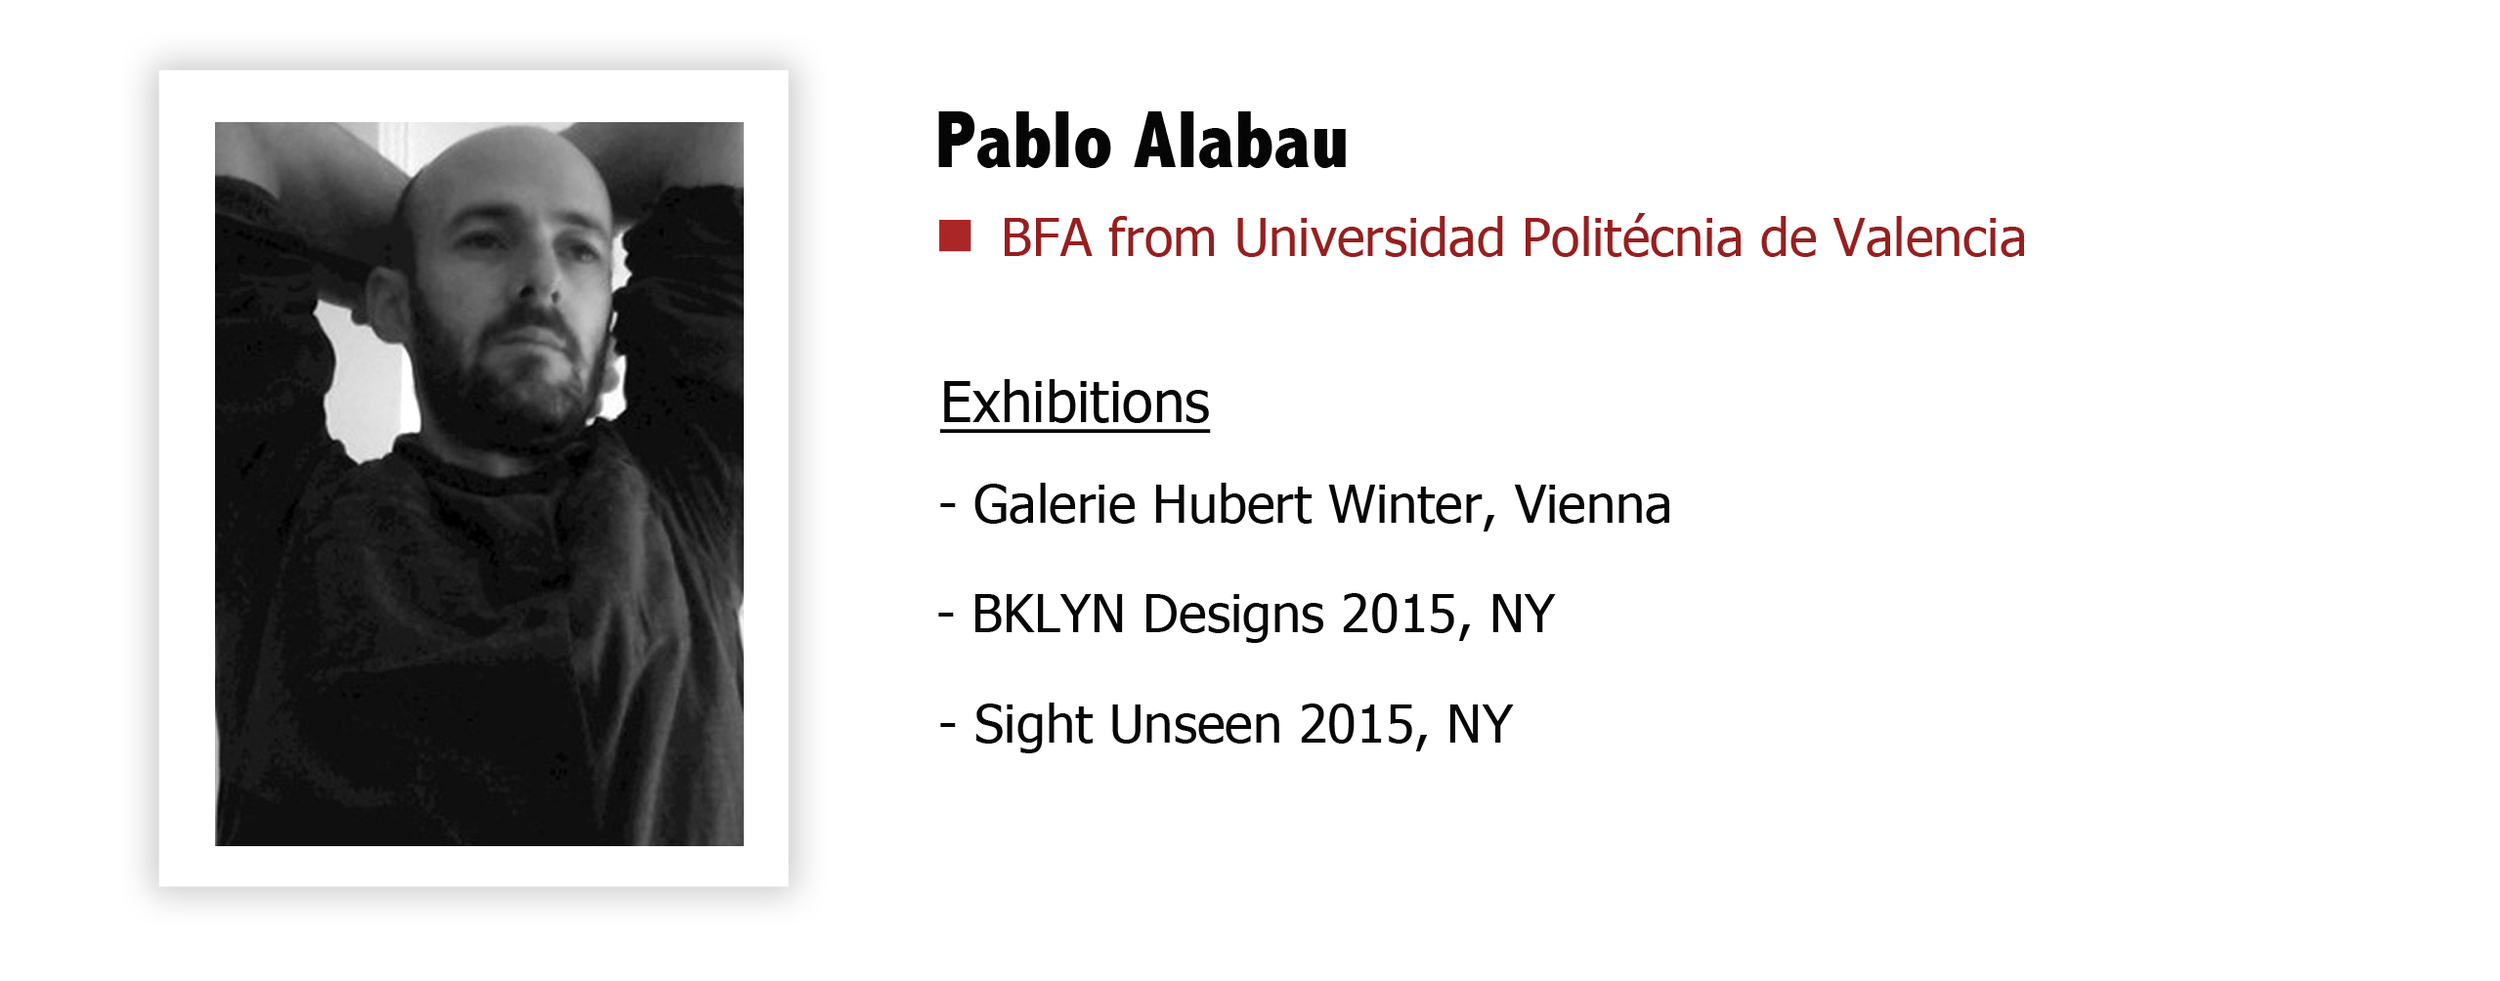 PabloAblau.jpg